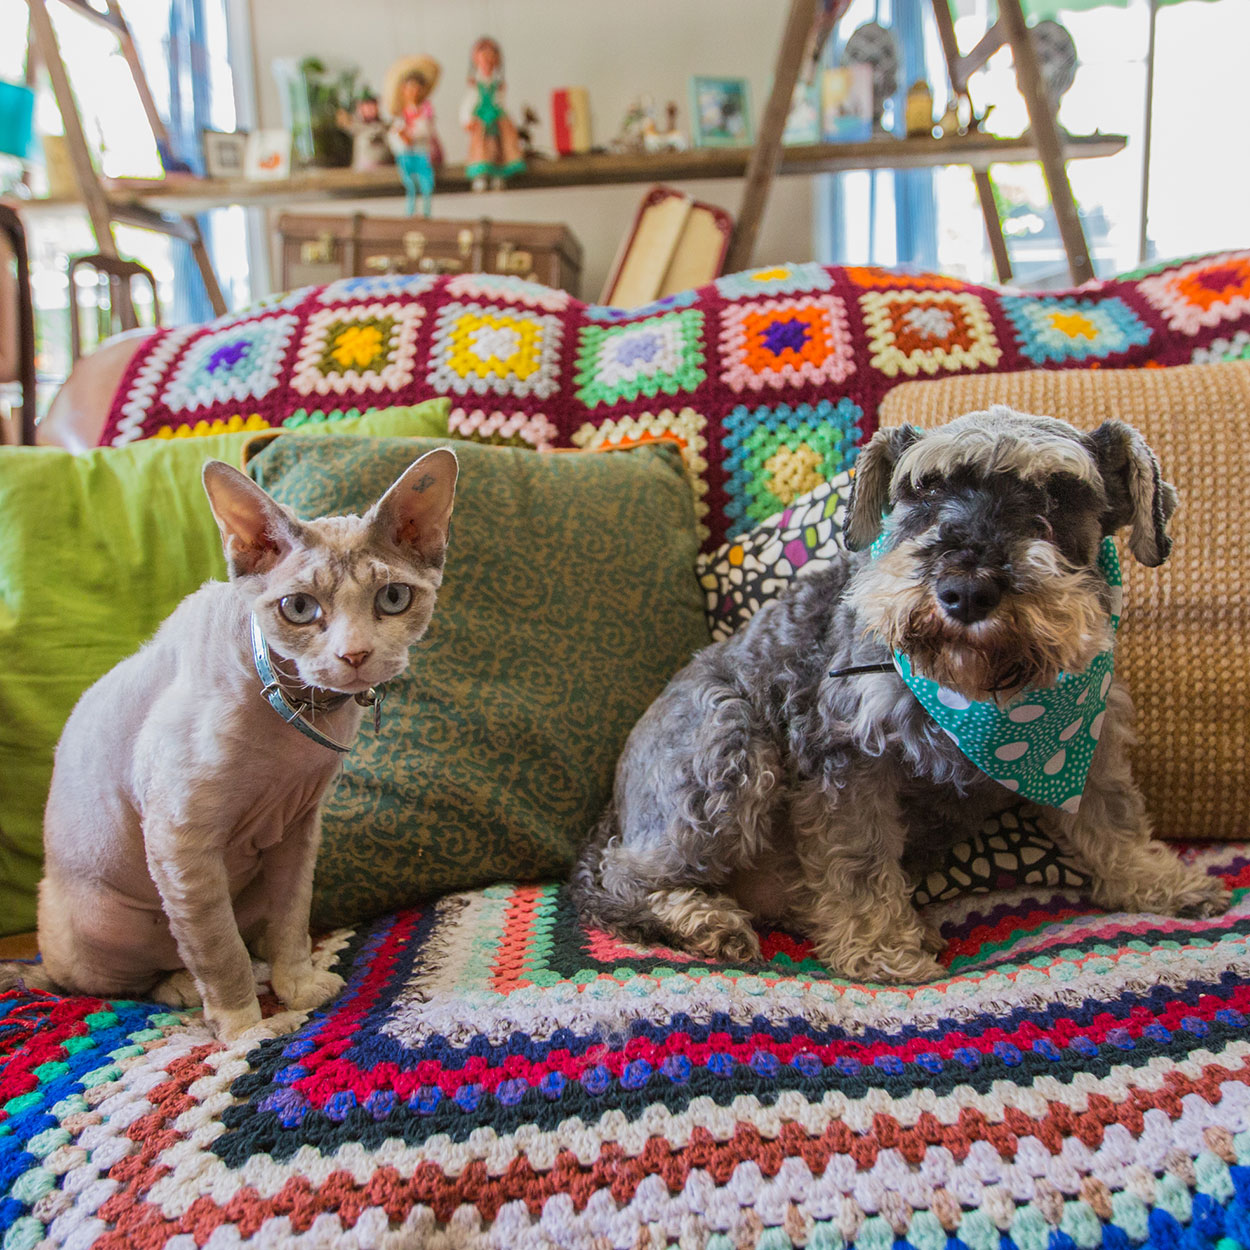 sunshine-coast-animal-photographer-animal-mooloolaba-maroochydore-buderim-mudjimba-marcoola-coolum-Australian-noosa-national-park-maleny-caloundra-dog-cat-all-the-love-in-the-world-photography-06